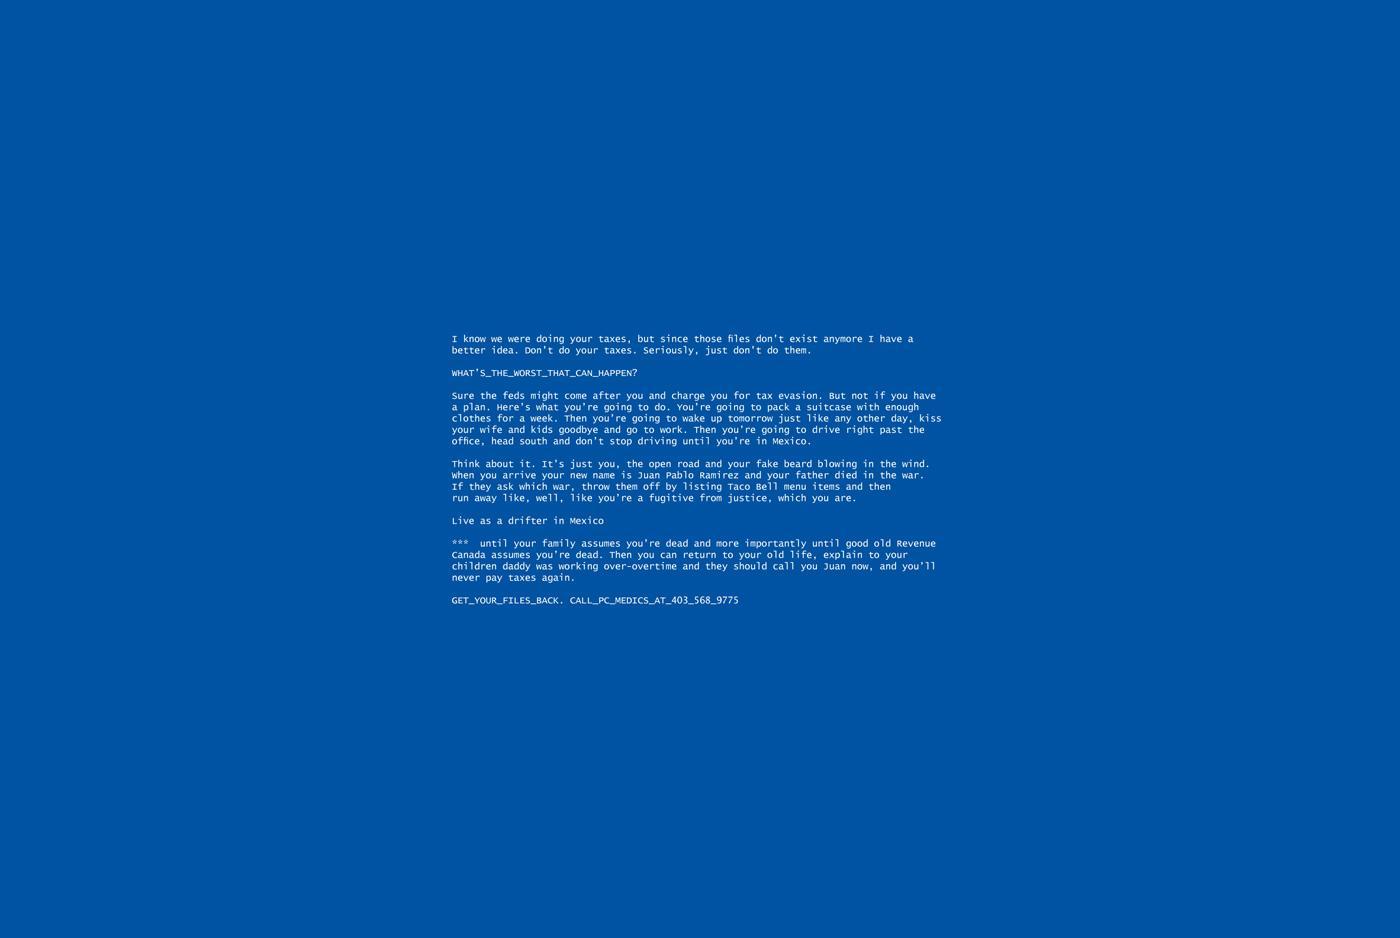 PC medic Print Ad -  Blue screen, 1